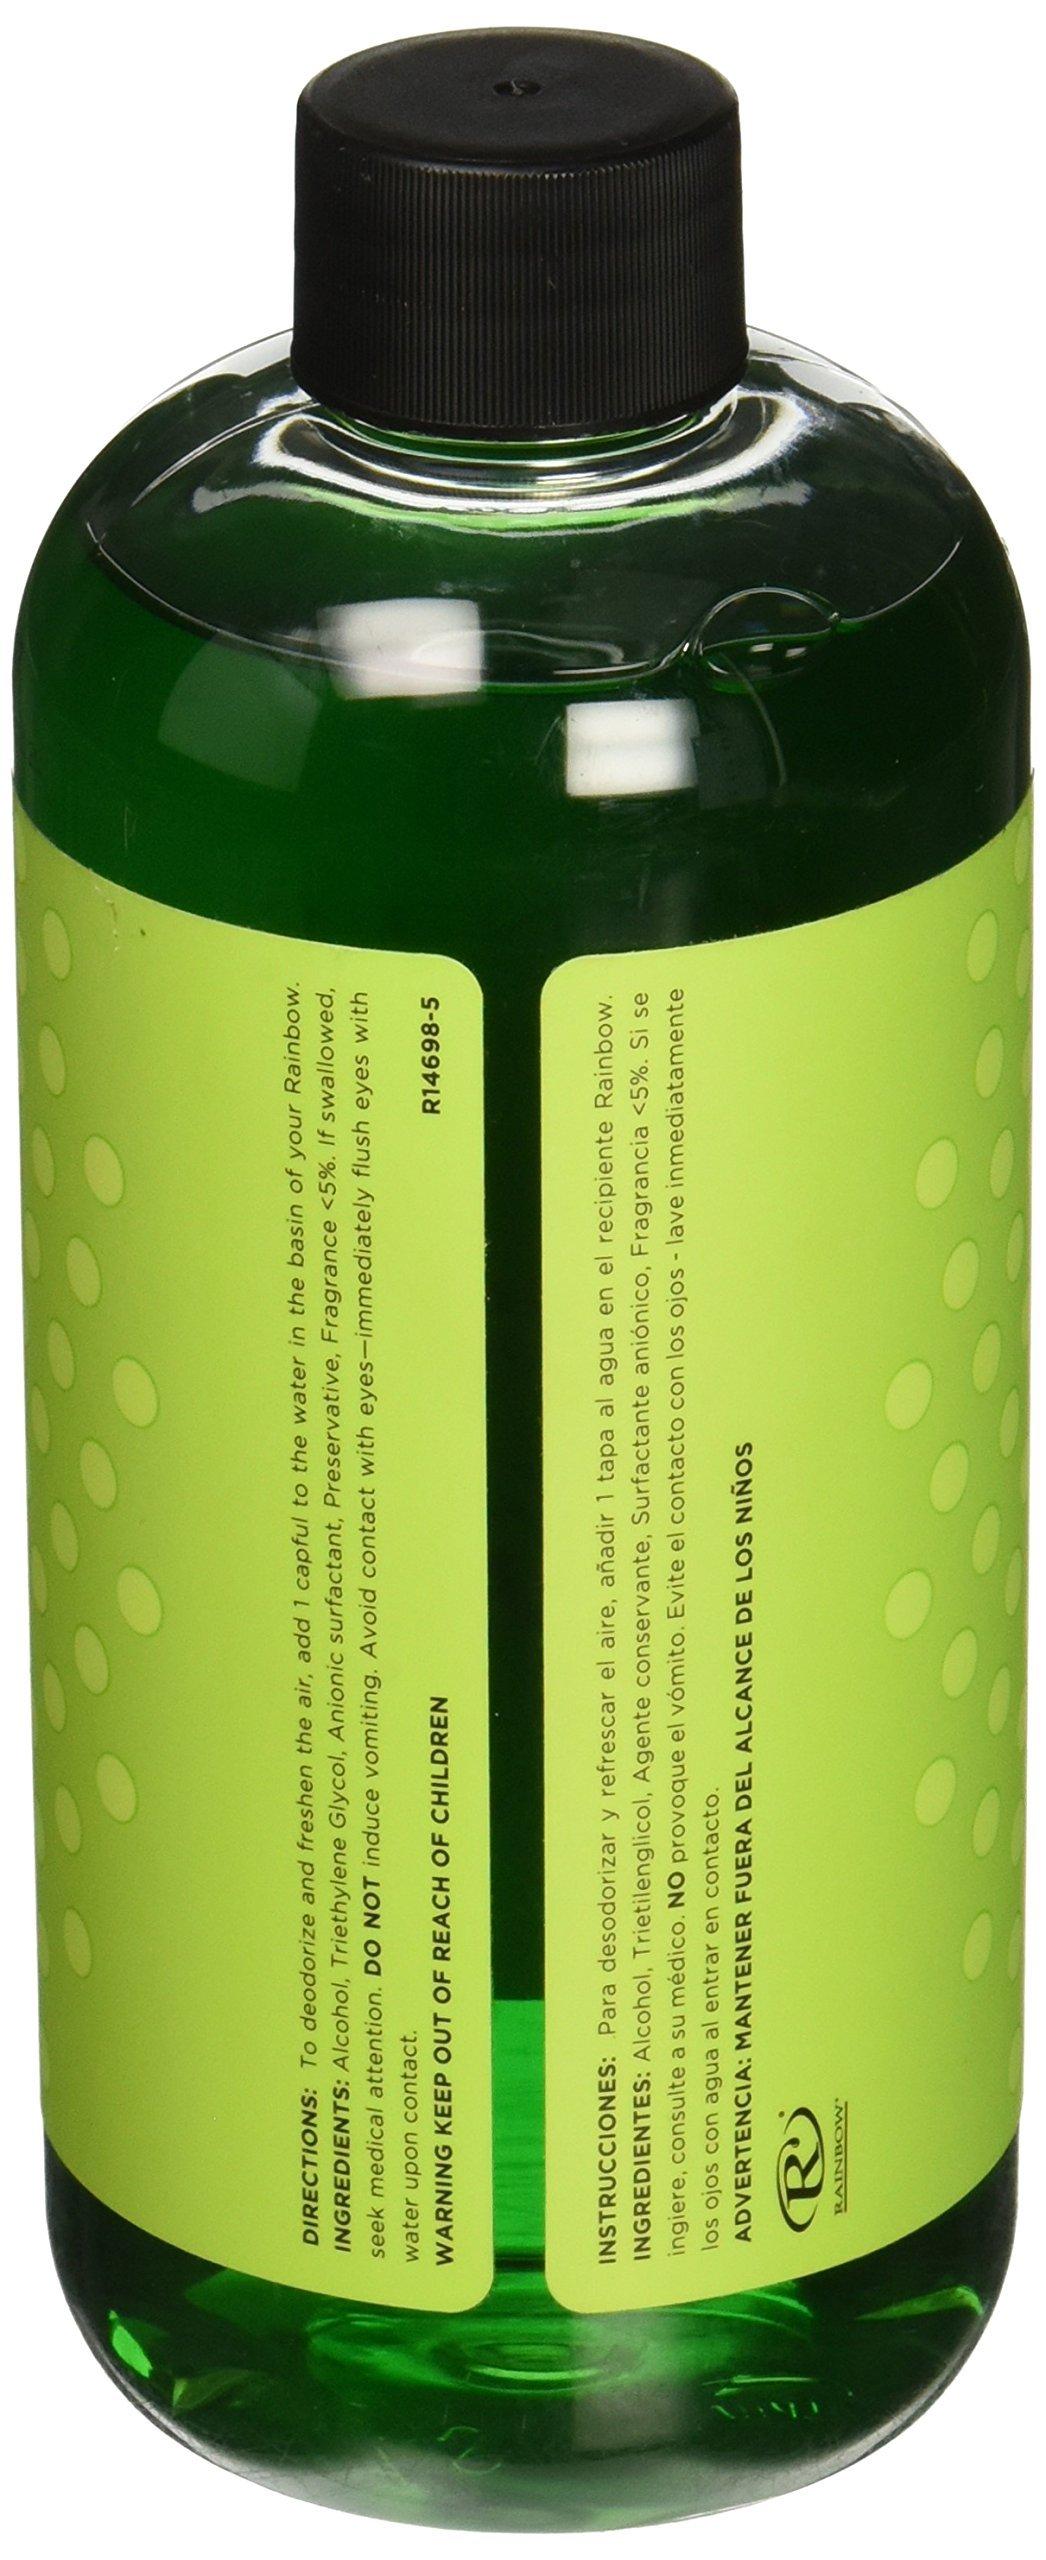 Rainbow Fresh Air Freshener/Deodorizer, 16 Fl oz. by Rexair (Image #2)